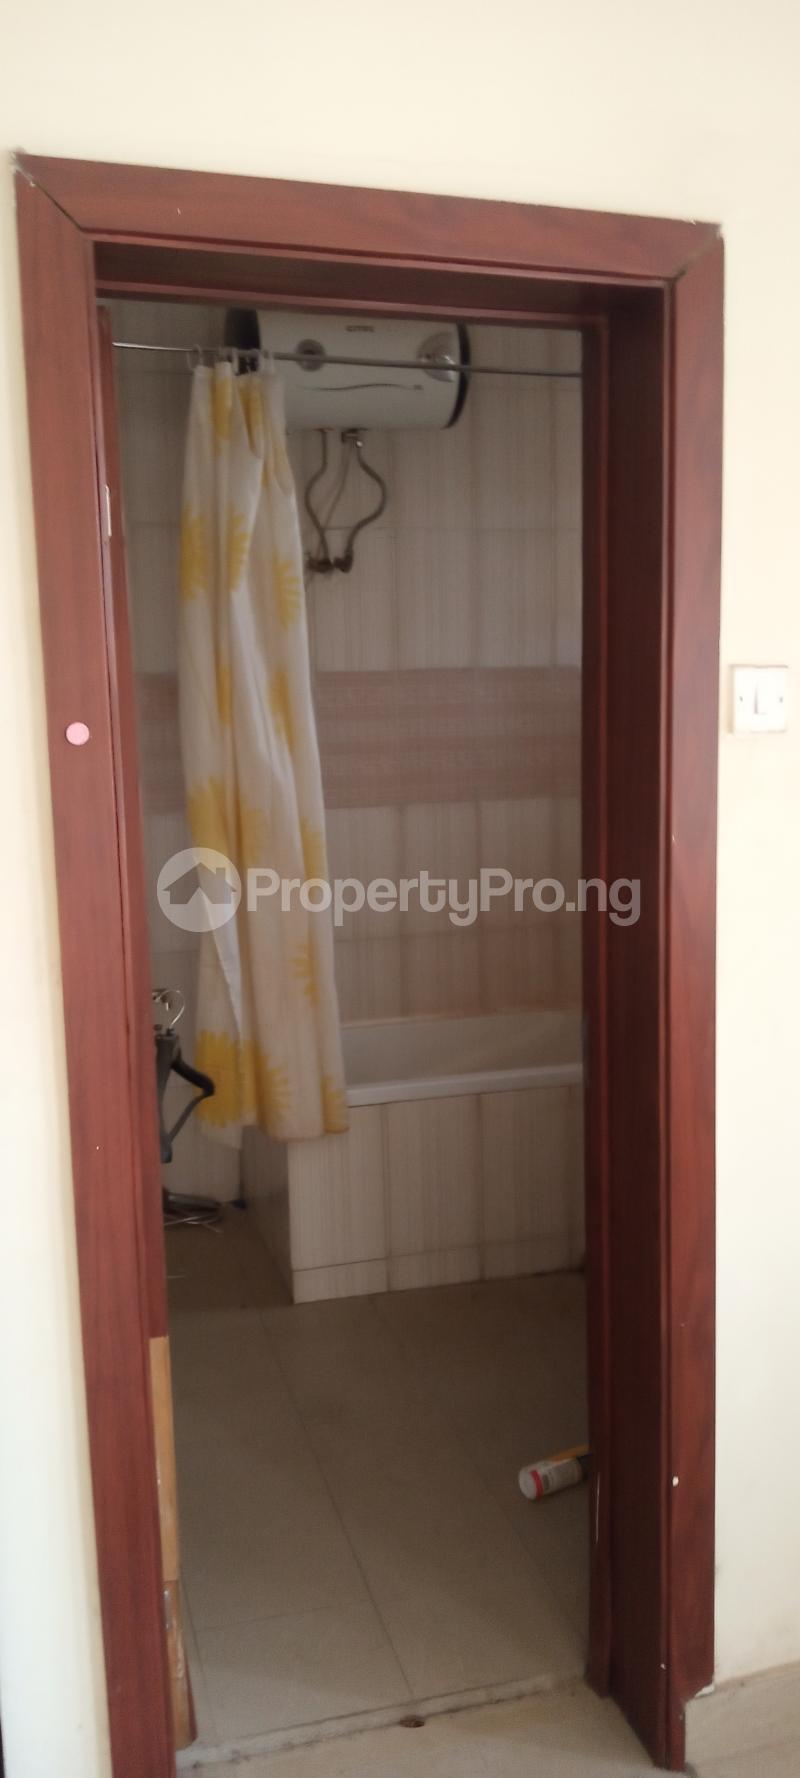 4 bedroom Flat / Apartment for rent Citec by jabi road ...